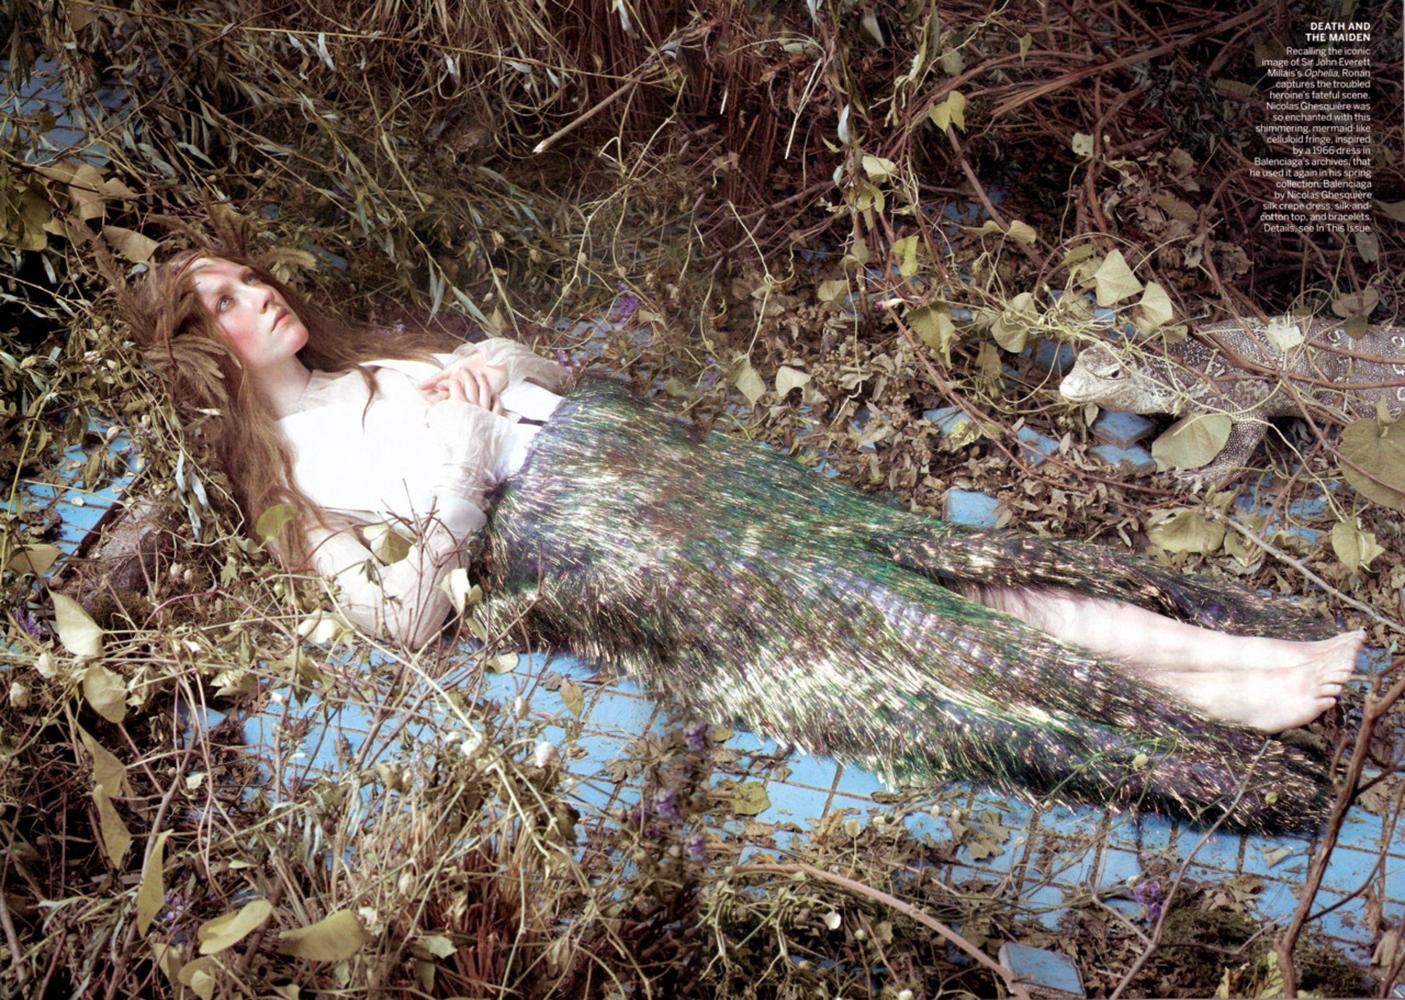 https://pics.wikifeet.com/Saoirse-Ronan-Feet-1560509.jpg